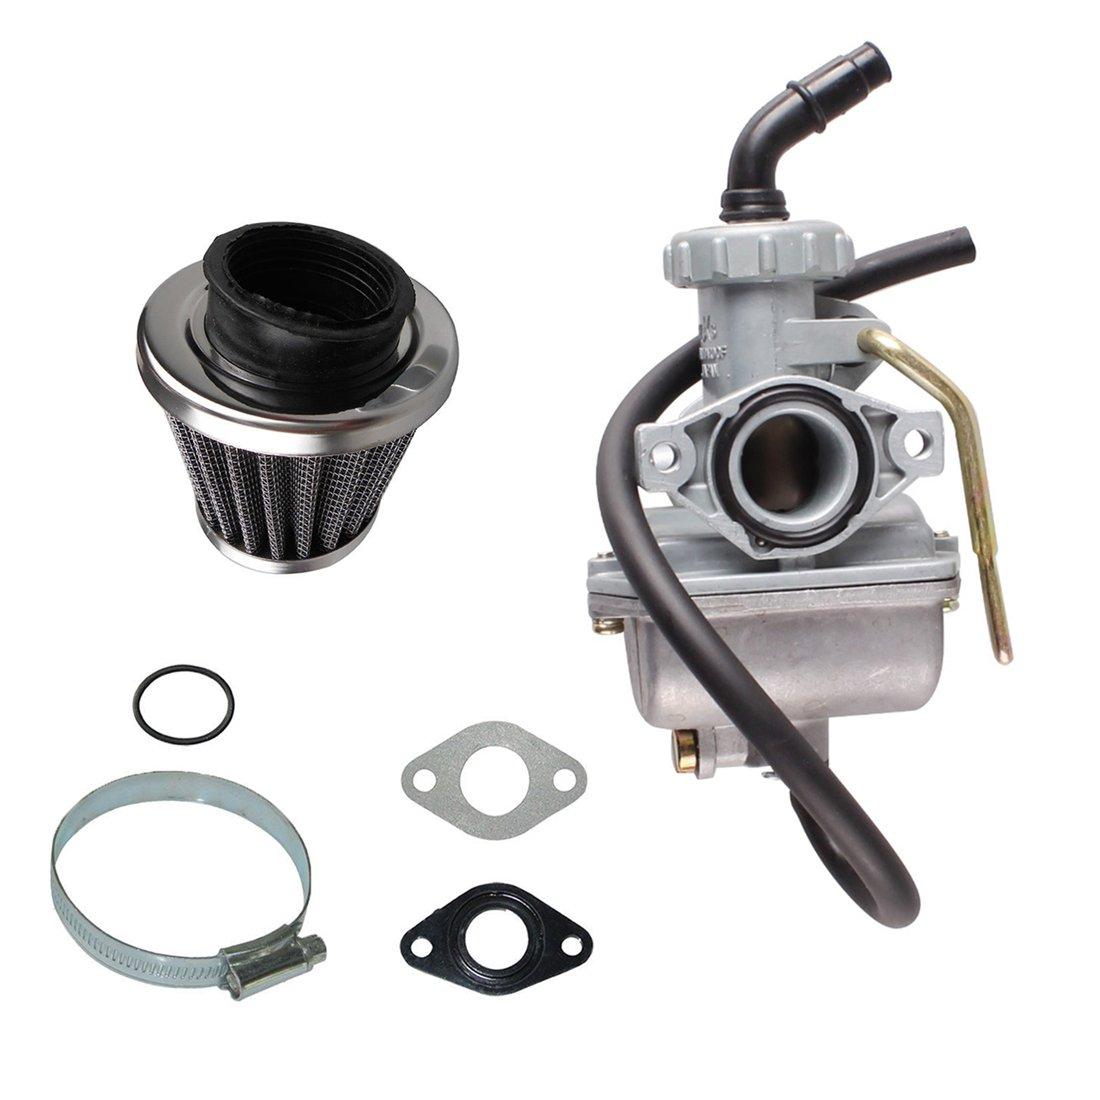 20mm Intake Carburetor For Suzuki 110cc Motorcycle Atv Parts Atv,rv,boat & Other Vehicle Atv Parts & Accessories